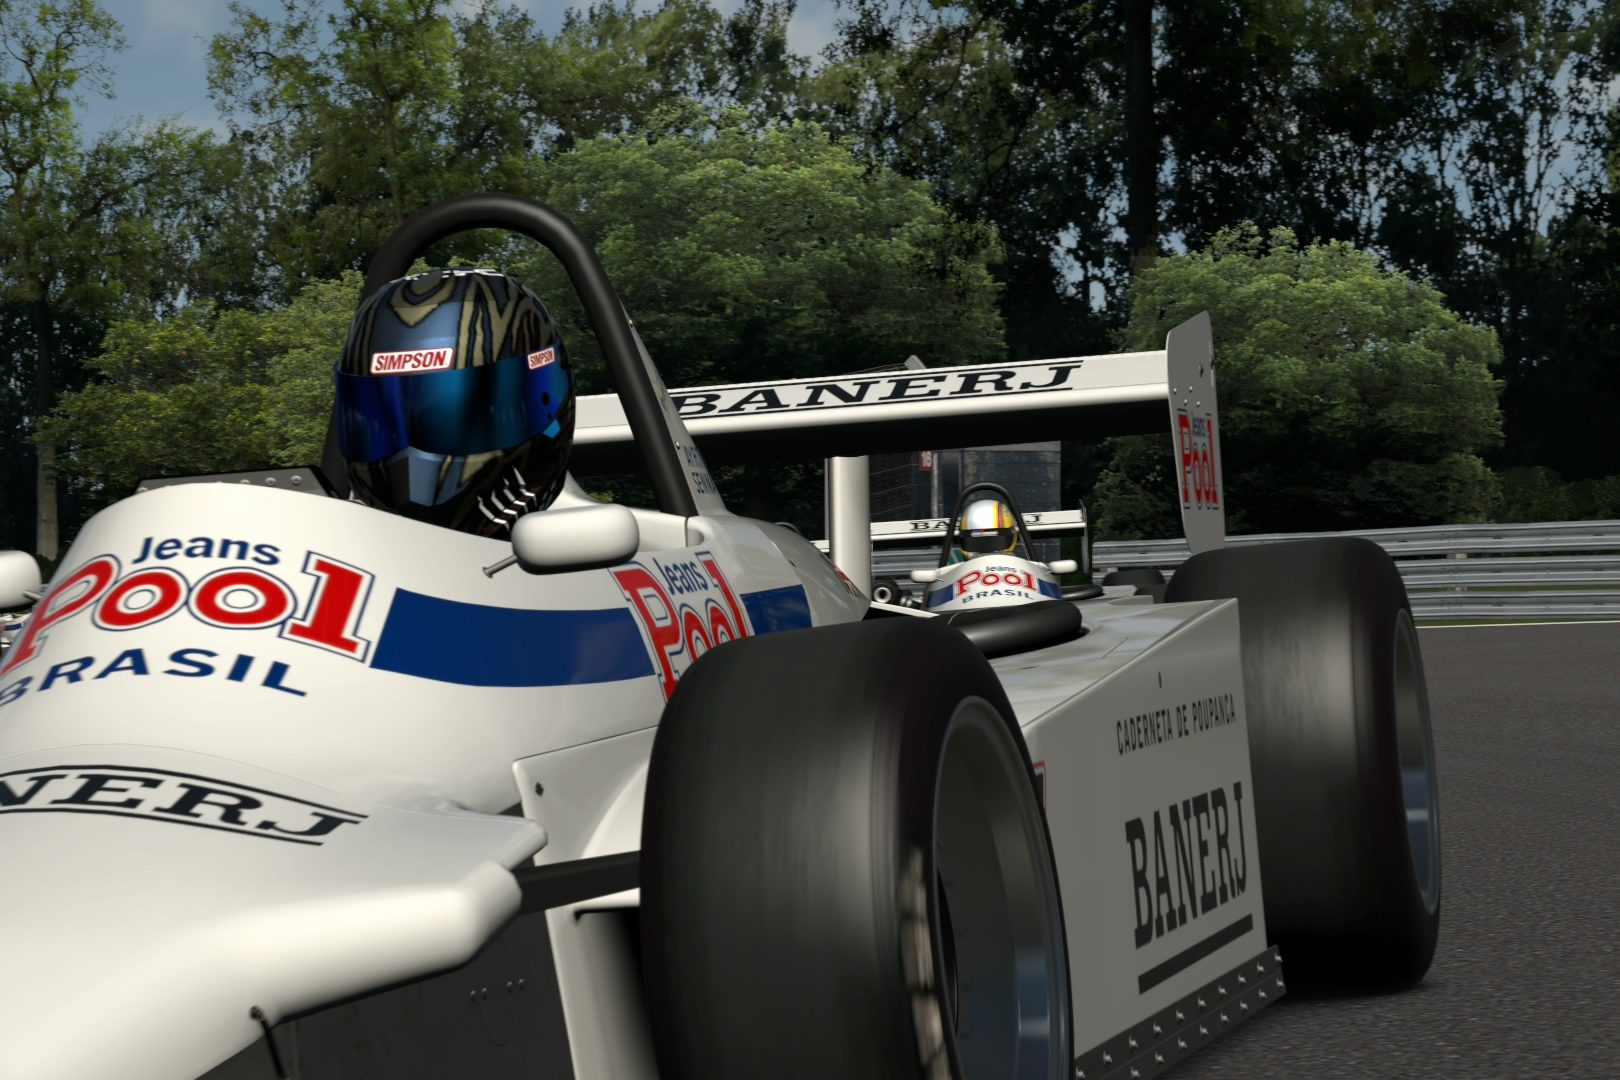 Brands Hatch Grand Prix Circuit '80s_22.jpg